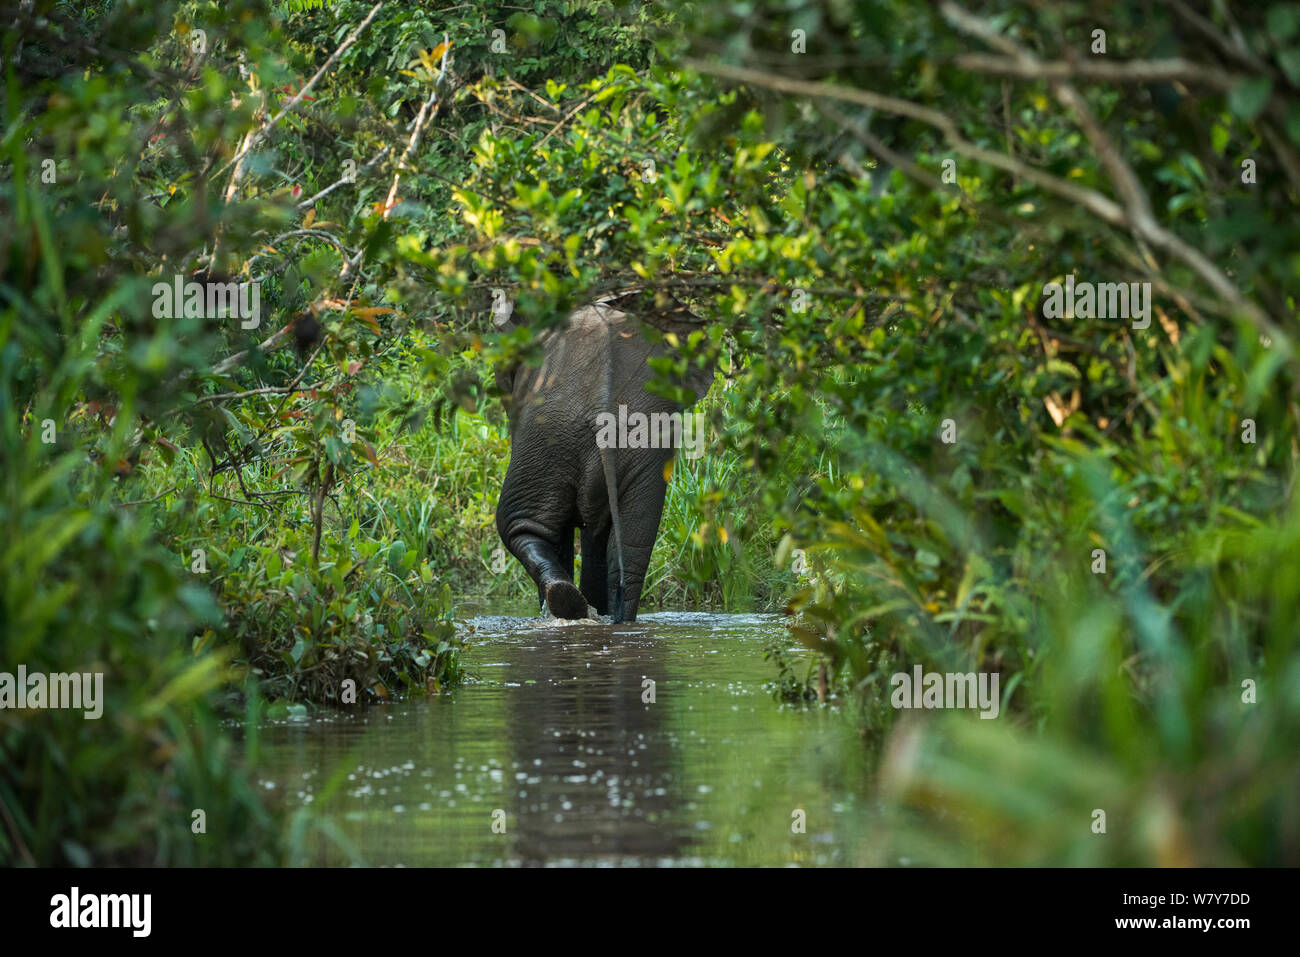 African forest elephant (Loxodonta cyclotis) Lekoli River, Republic of Congo (Congo-Brazzaville), Africa. Vulnerable species. Stock Photo